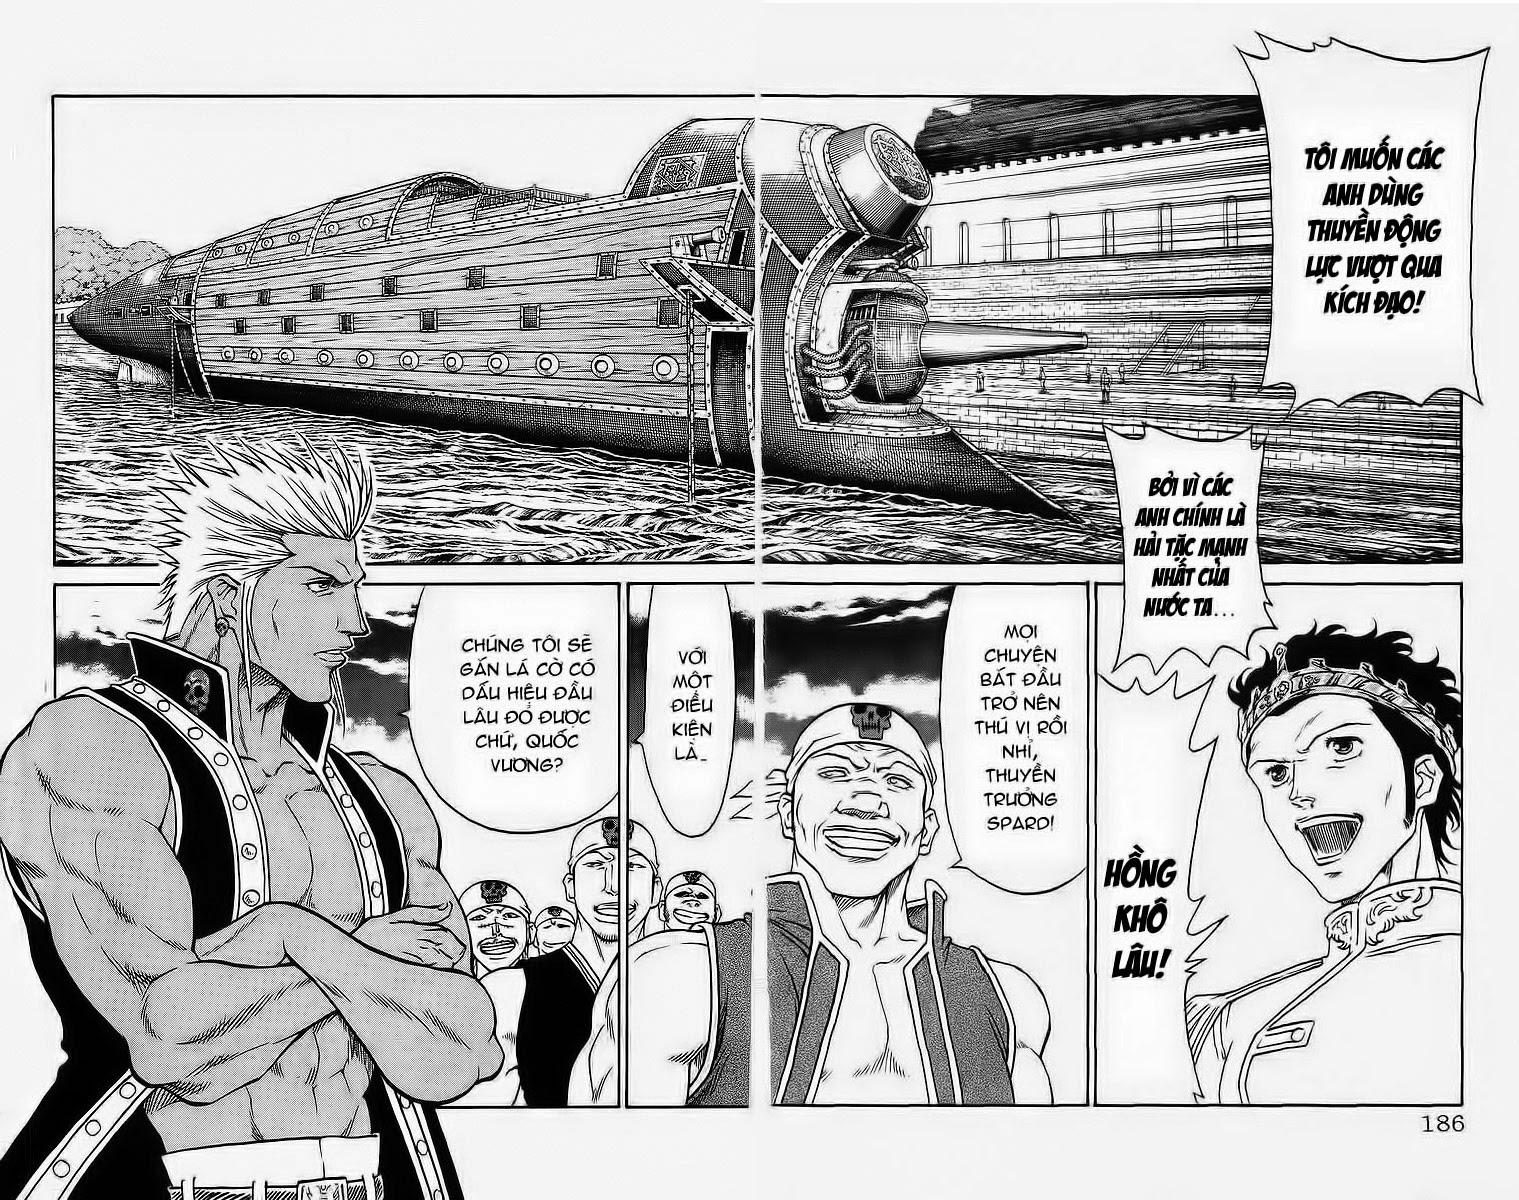 Vua Trên Biển – Coco Full Ahead chap 258 – End Trang 18 - Mangak.info